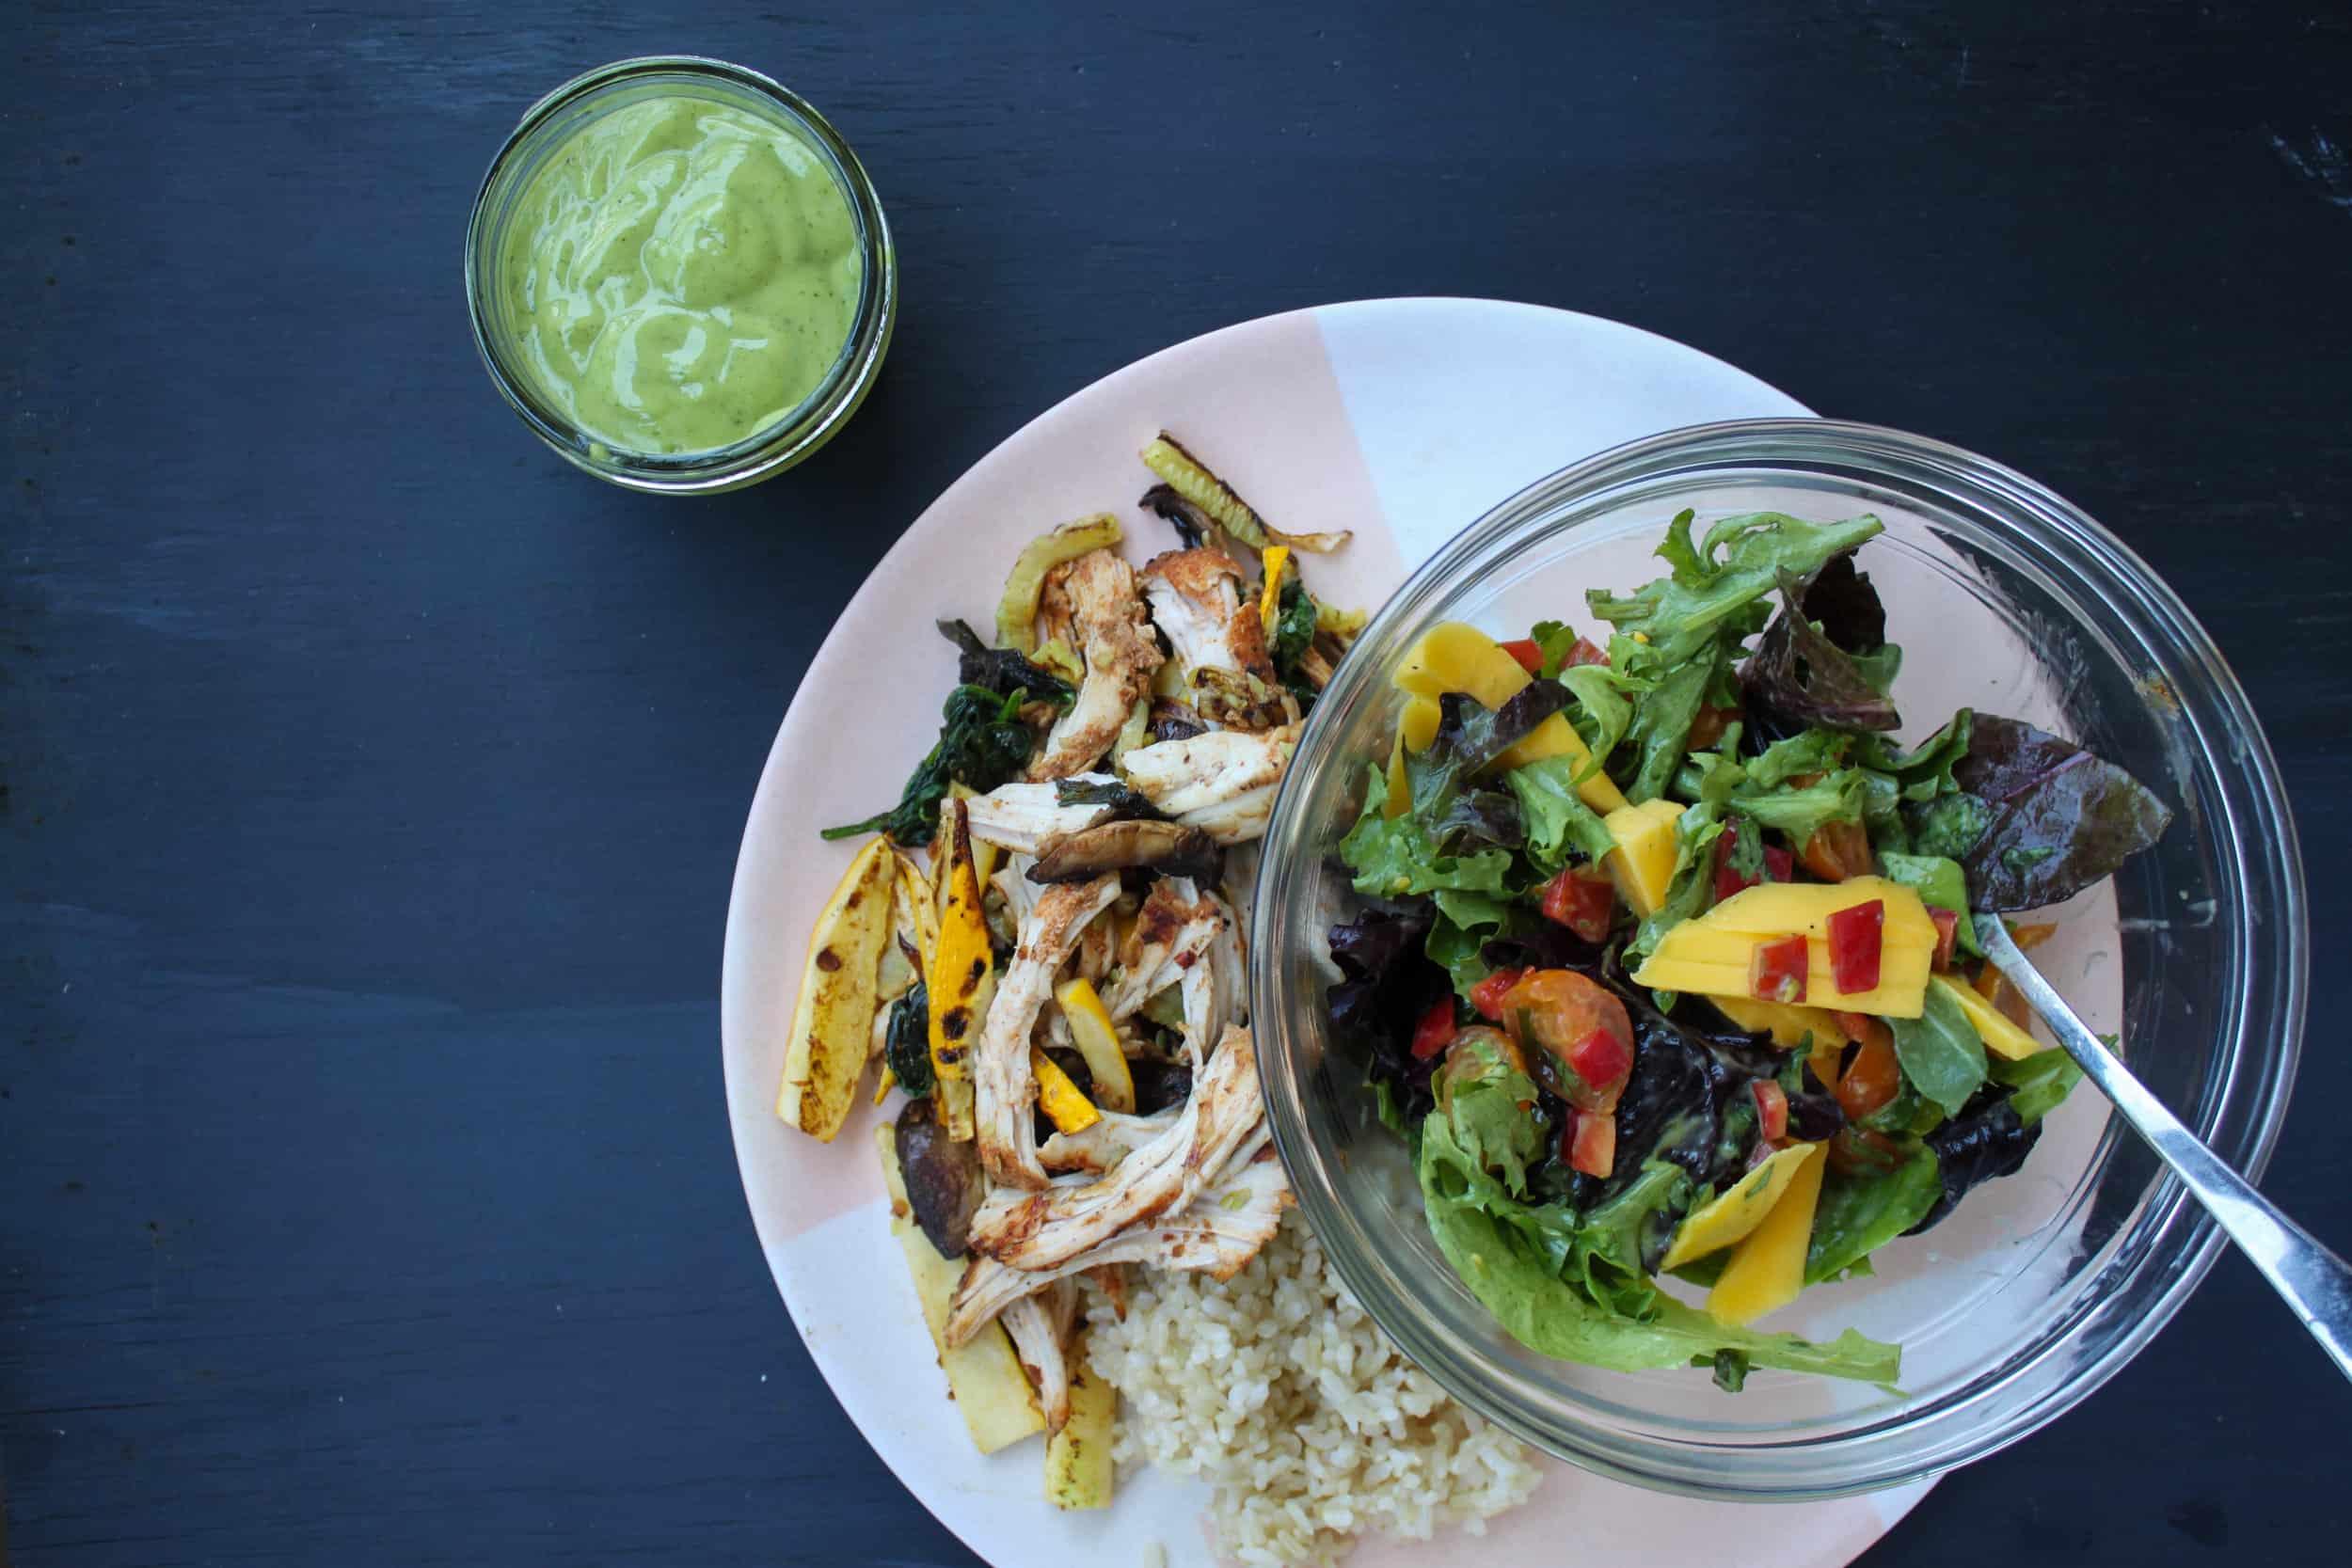 lime cilantro salad dressing 1 of 2